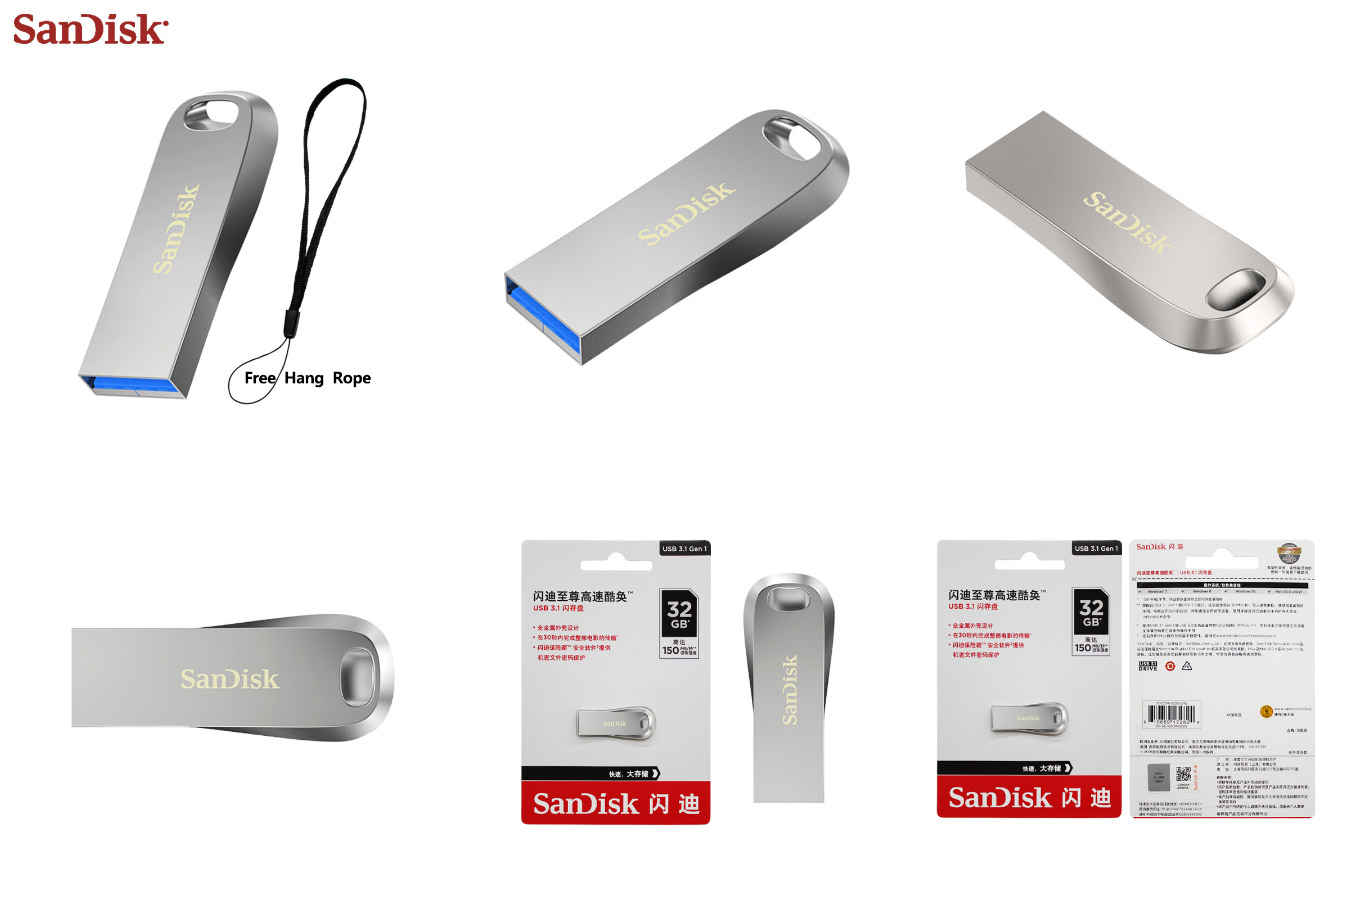 Компактная флешка большой ёмкости USB 3.1 Flash drive